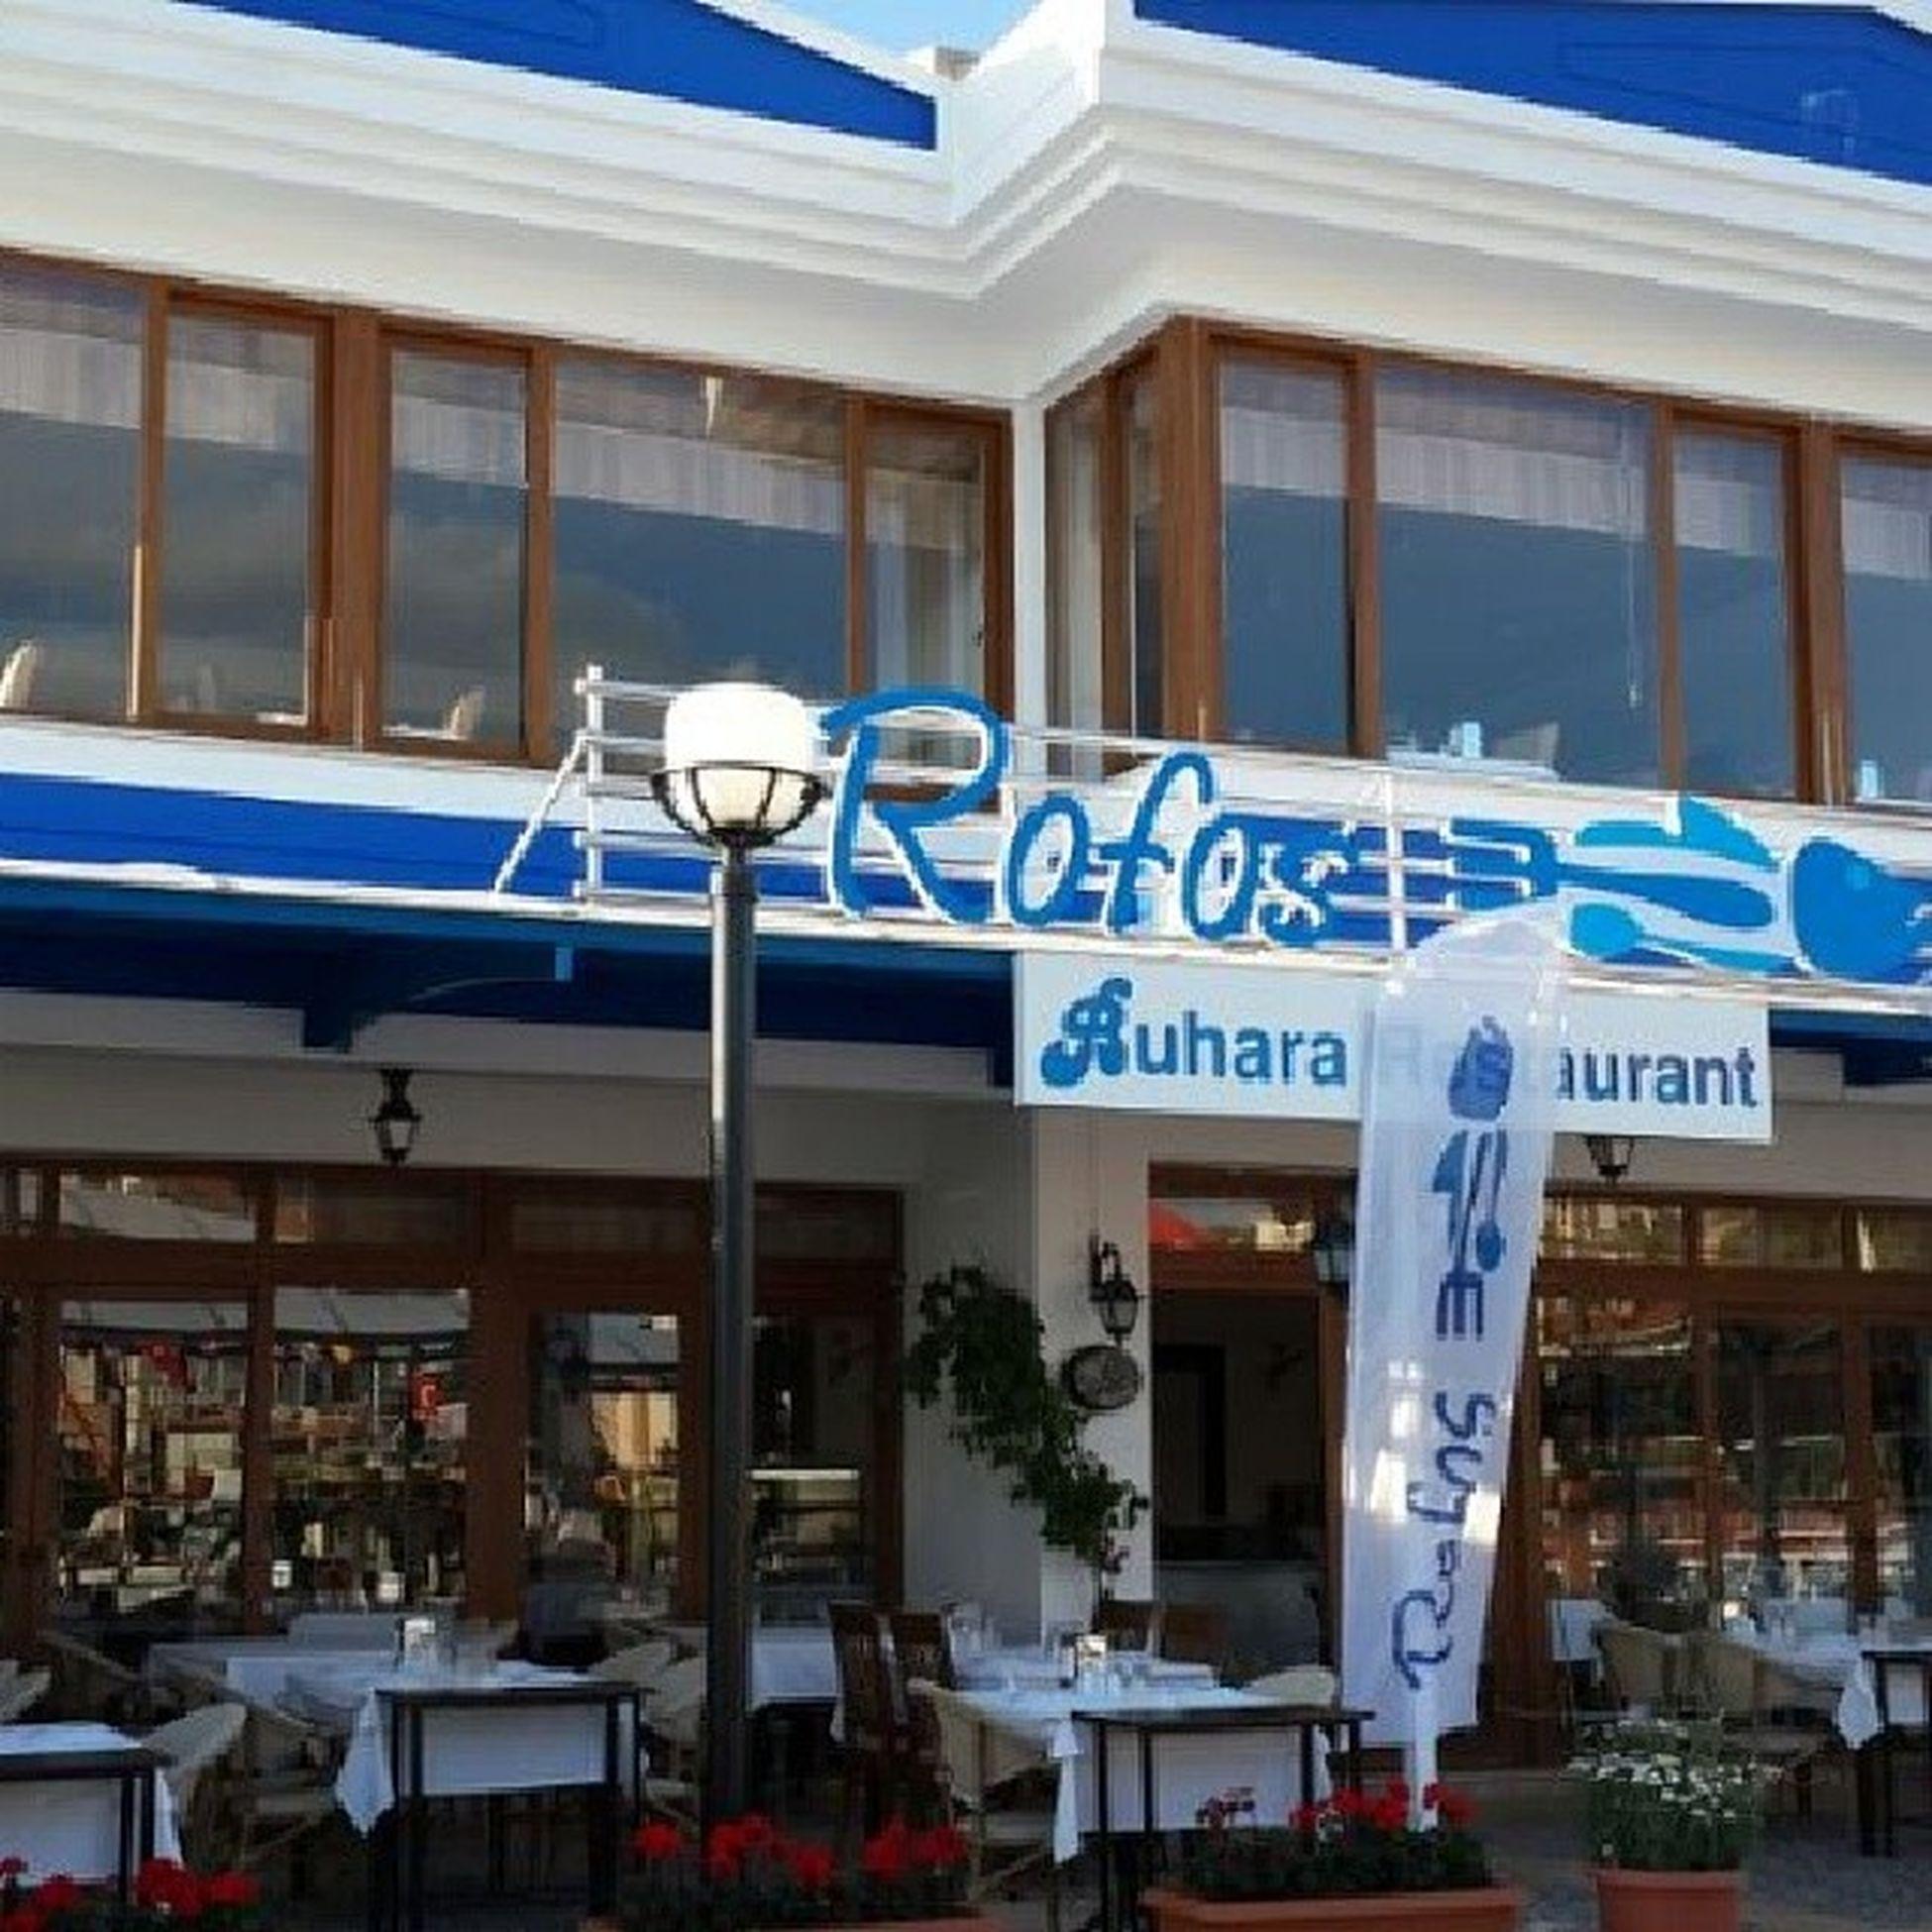 Izmir Cesmede Tek Adres @rofosrestaurant